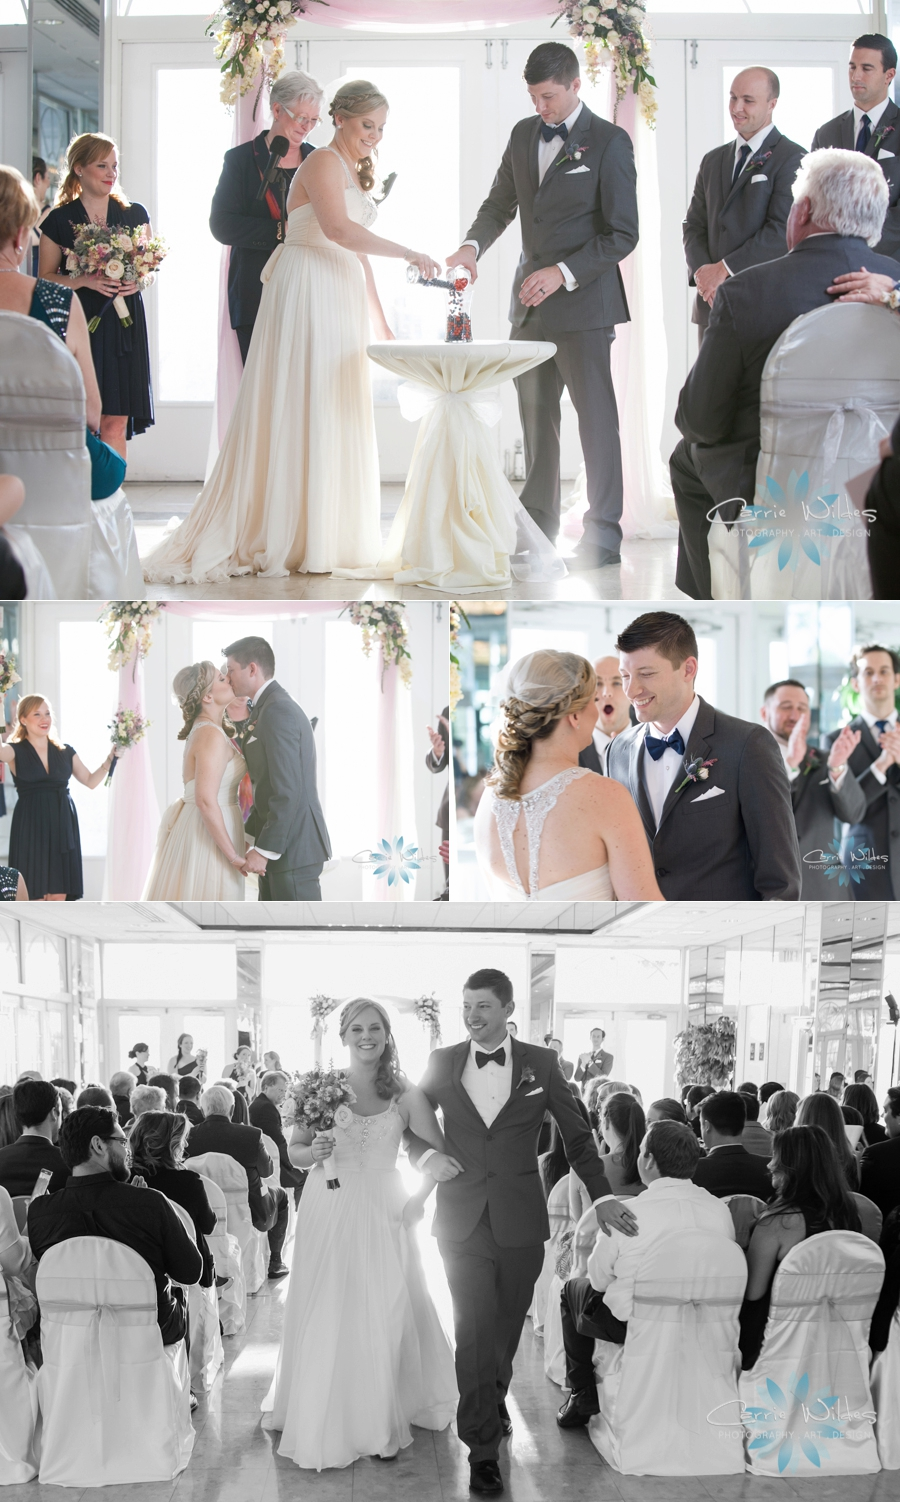 1_23_16 Grand Plaza Wedding_0025.jpg